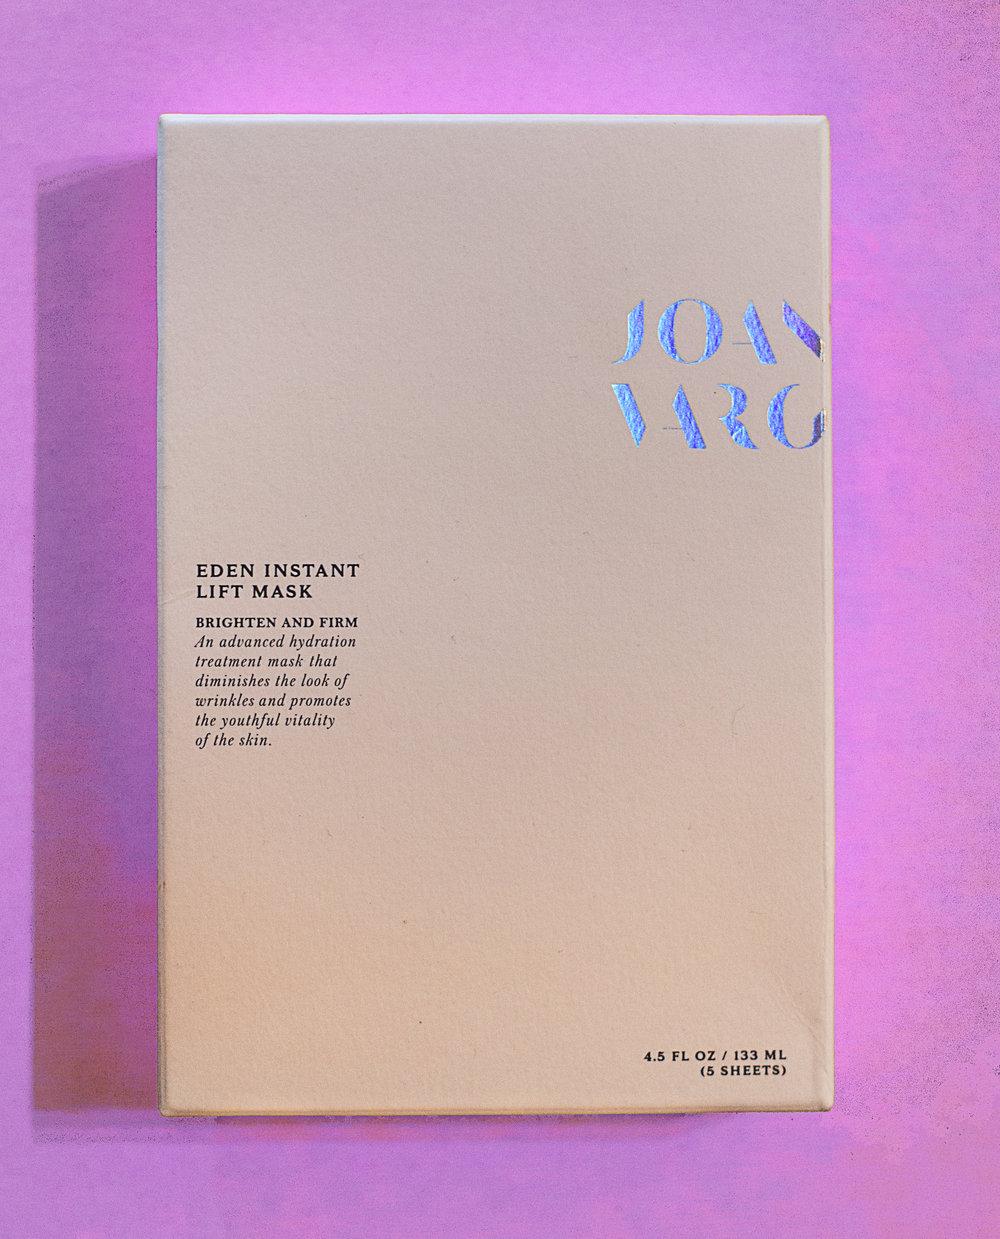 joanna-vargas-skincare-daily-hydrating-cream-celebrity-skincare-jvskincare-super-nova-serum-vitamin-c-serum-product-photography-katrina-eugenia-photography06.jpg